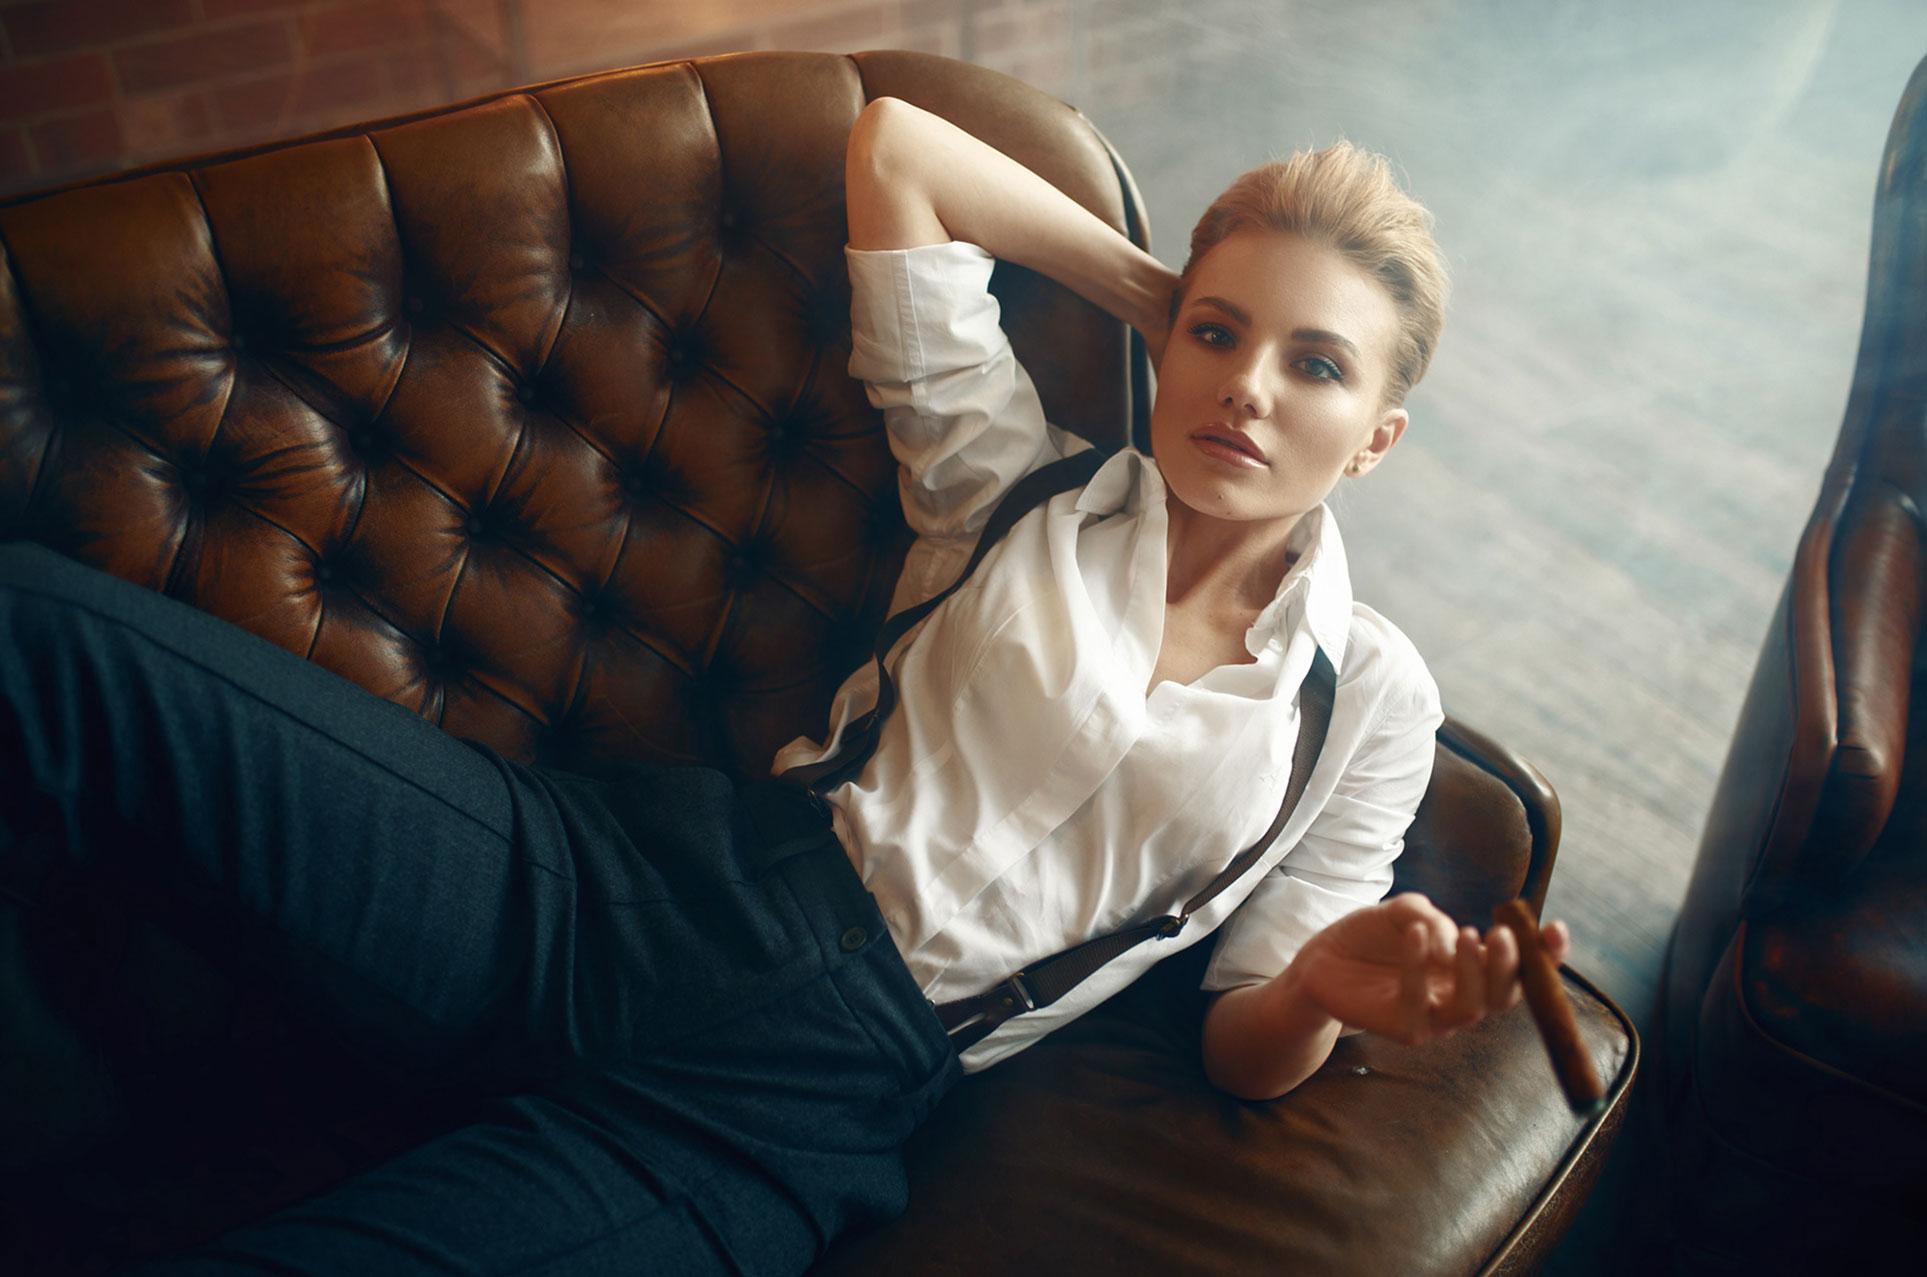 Olga Dolot by Maks Kuzin